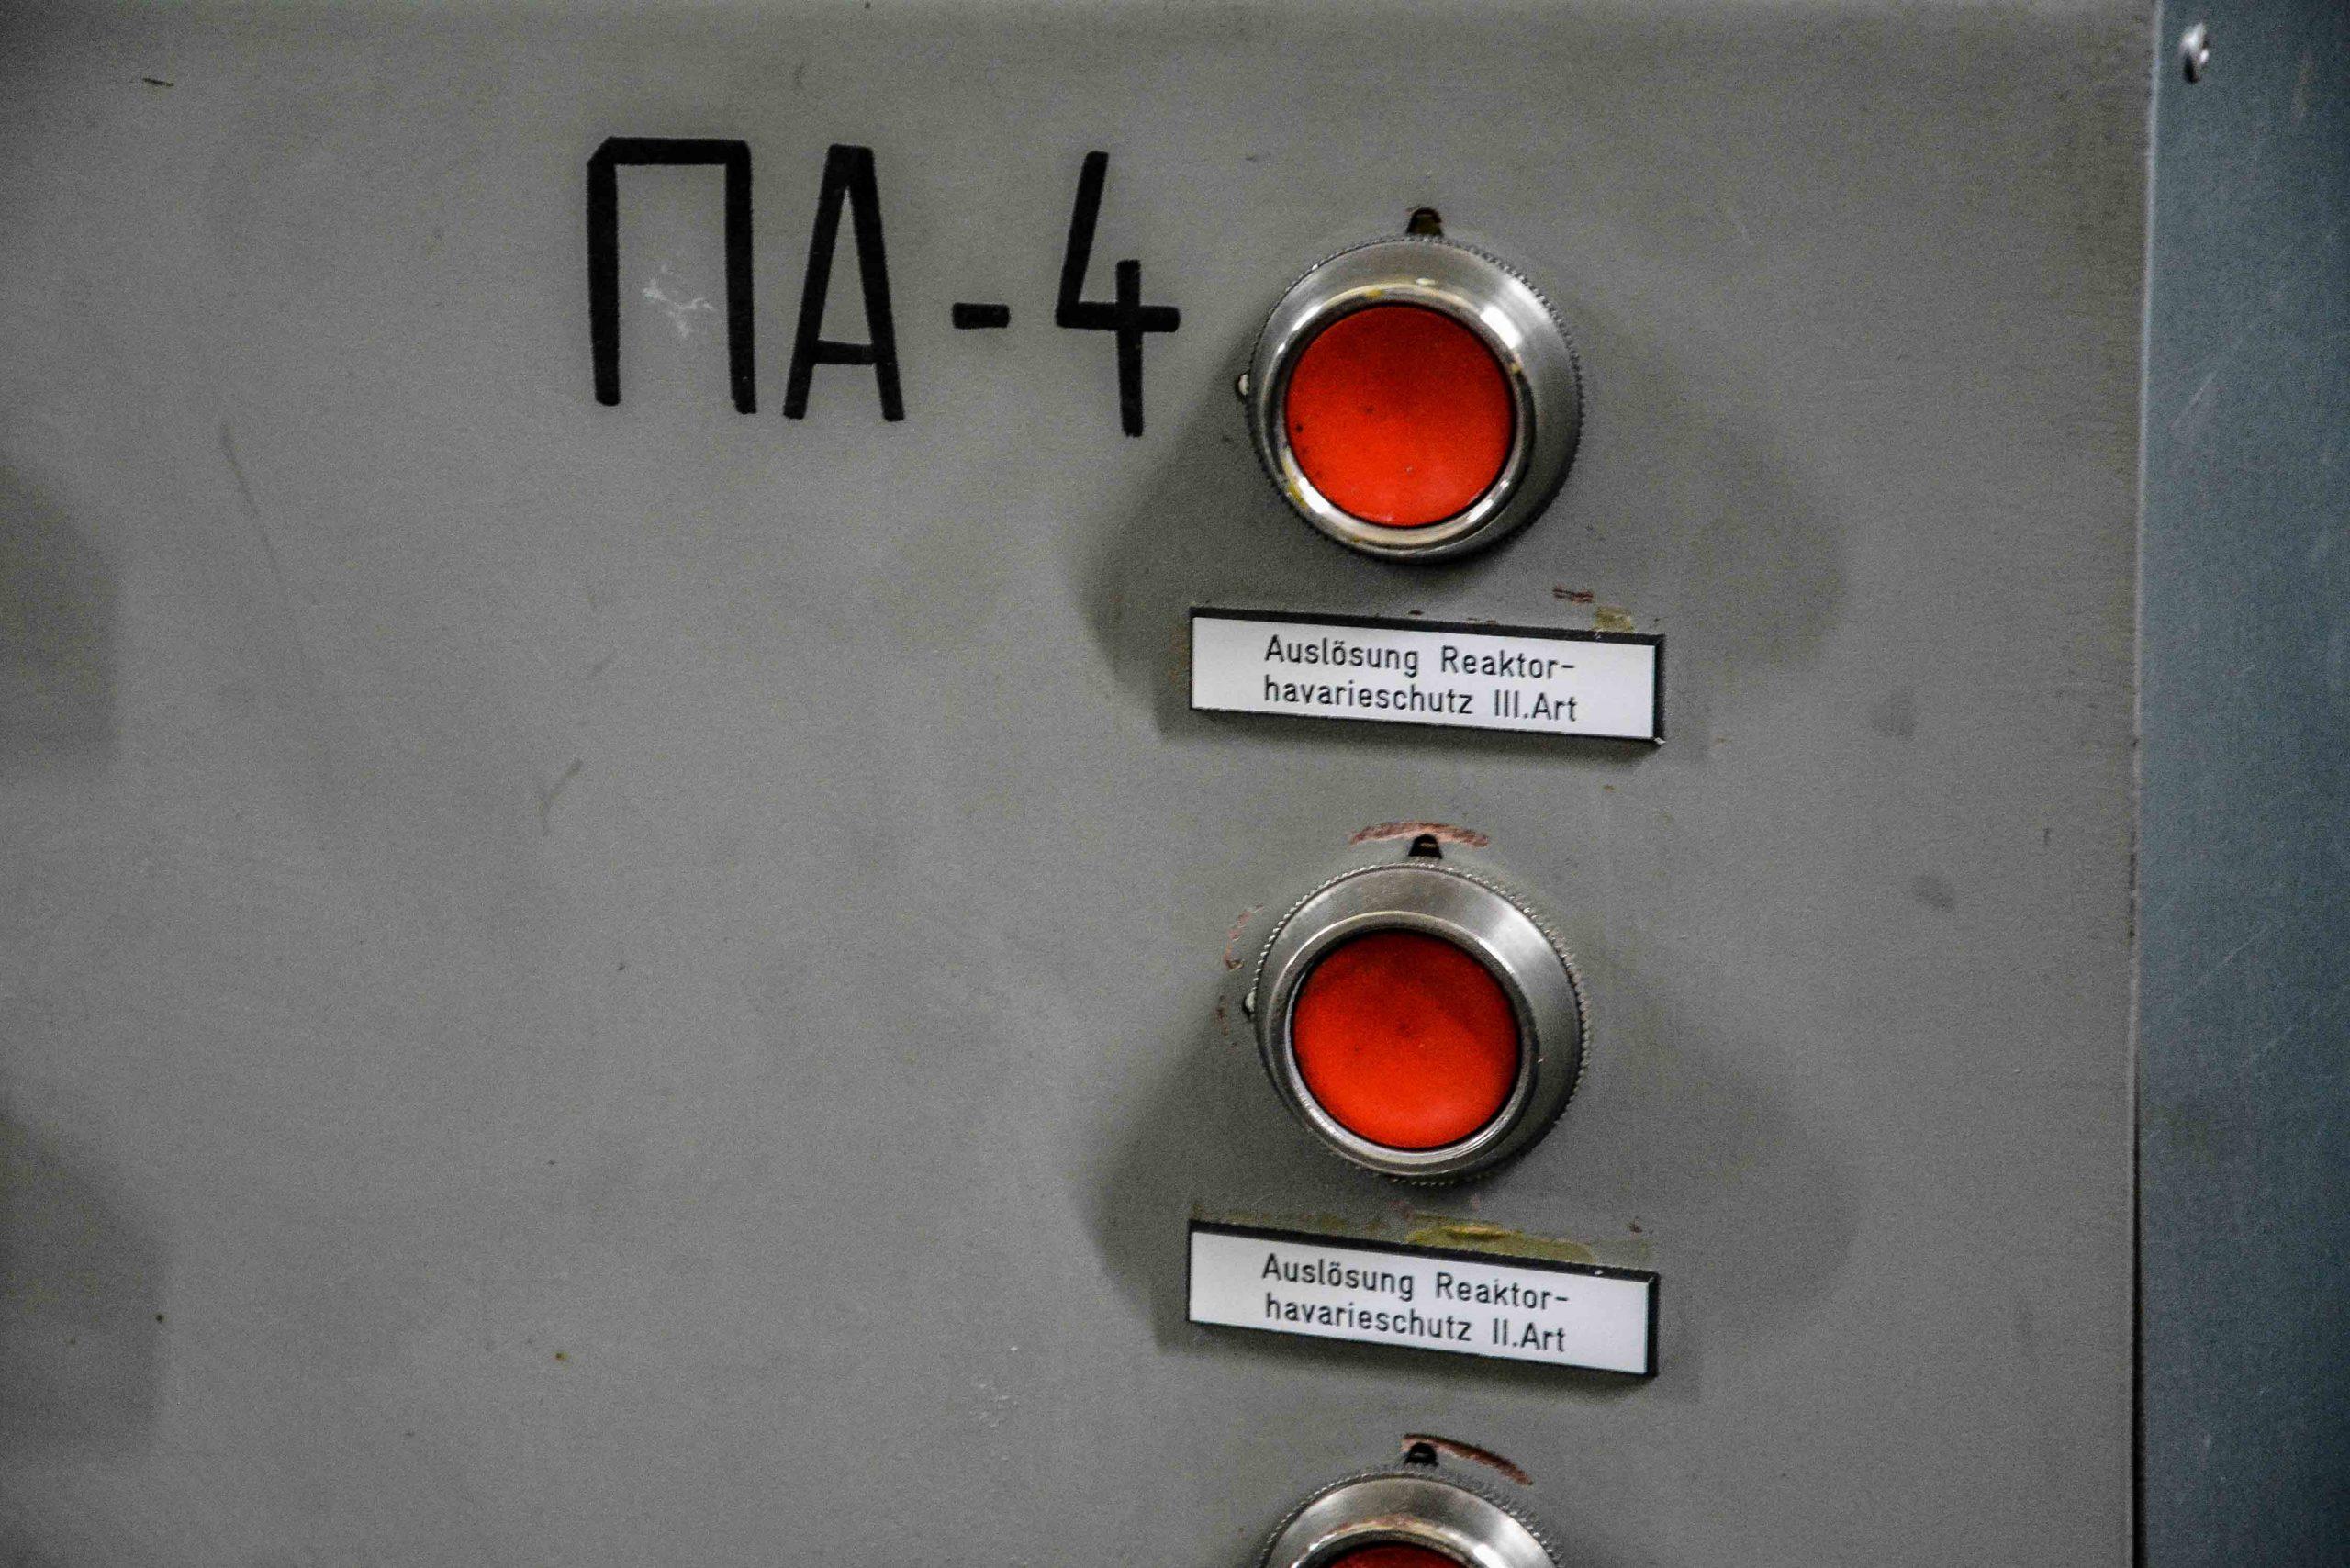 notknopf reaktor kernkraftwerk greifswald nuclear powerplant ost deutschland east germany gdr DDR mecklenburg vorpommern